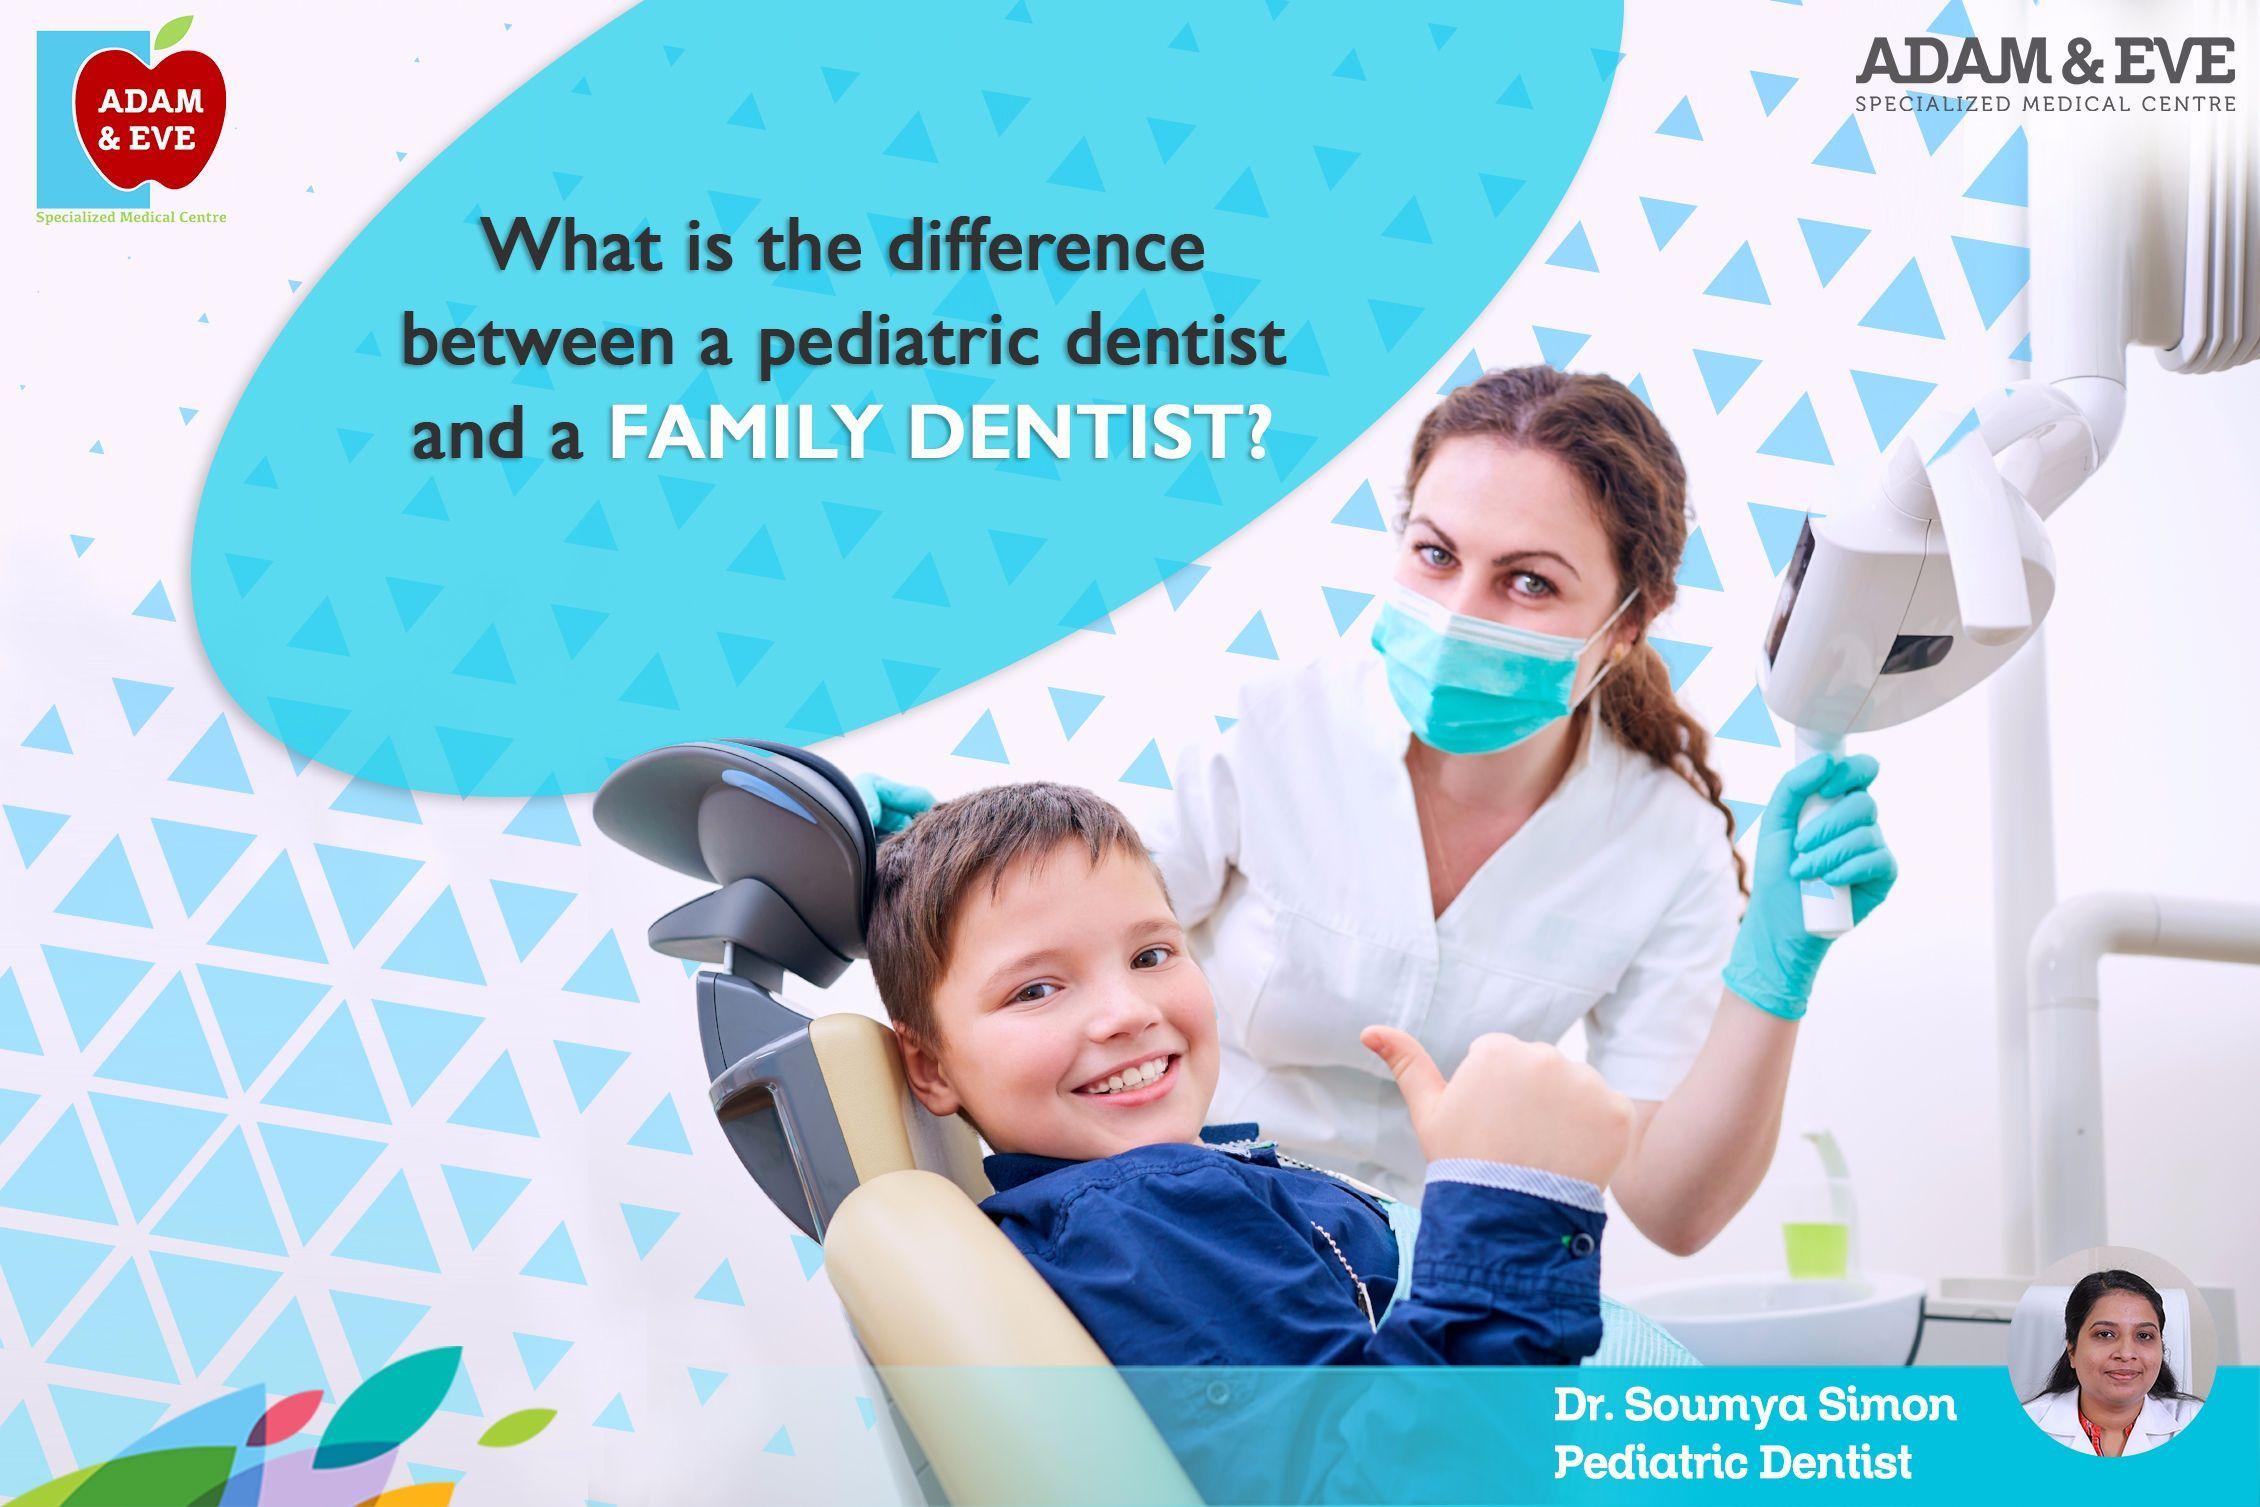 Pediatric Dentists Are The Pediatricians Of Dentistry A Pediatric